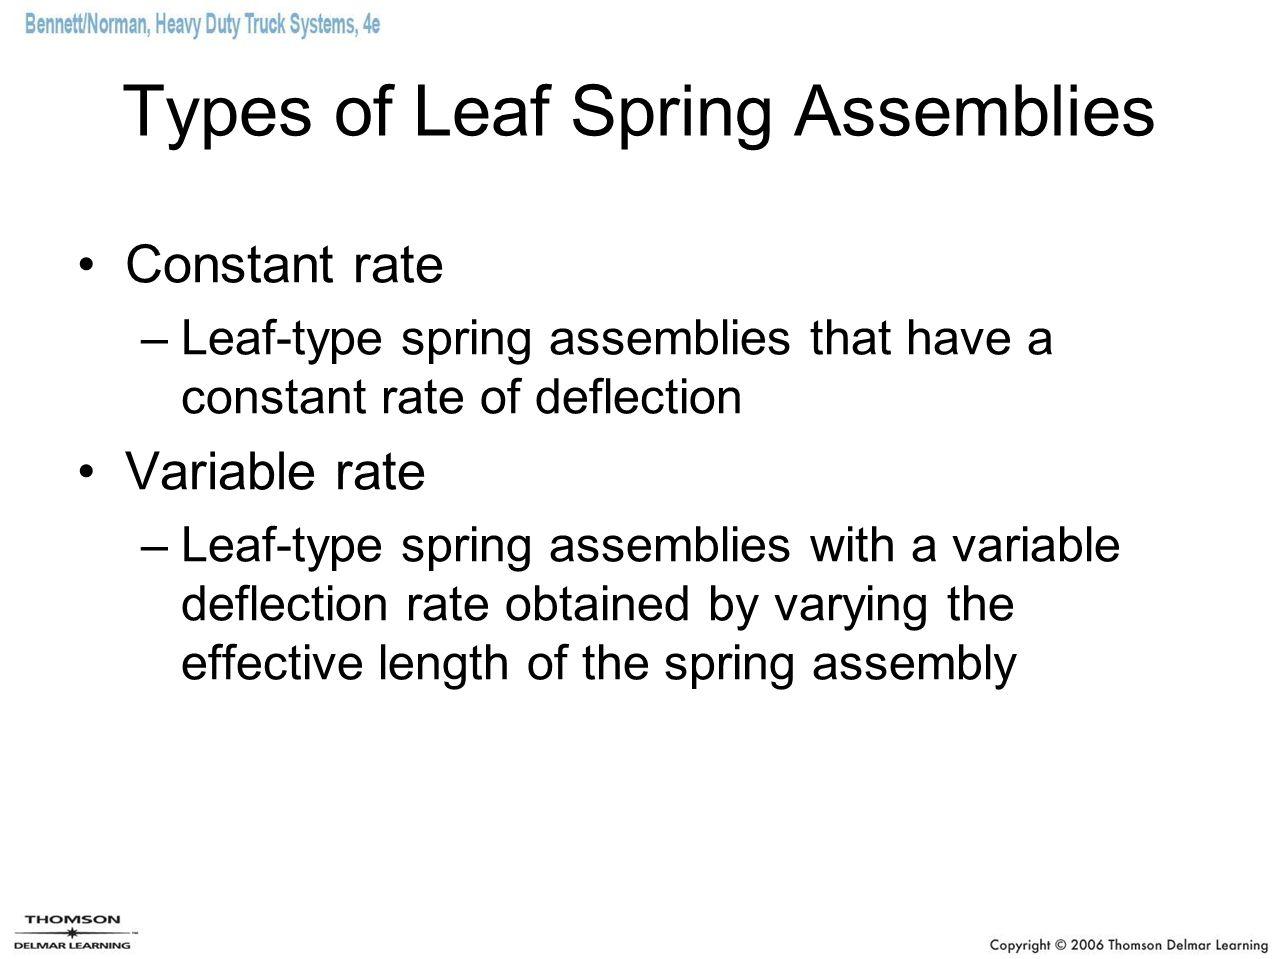 Types of Leaf Spring Assemblies